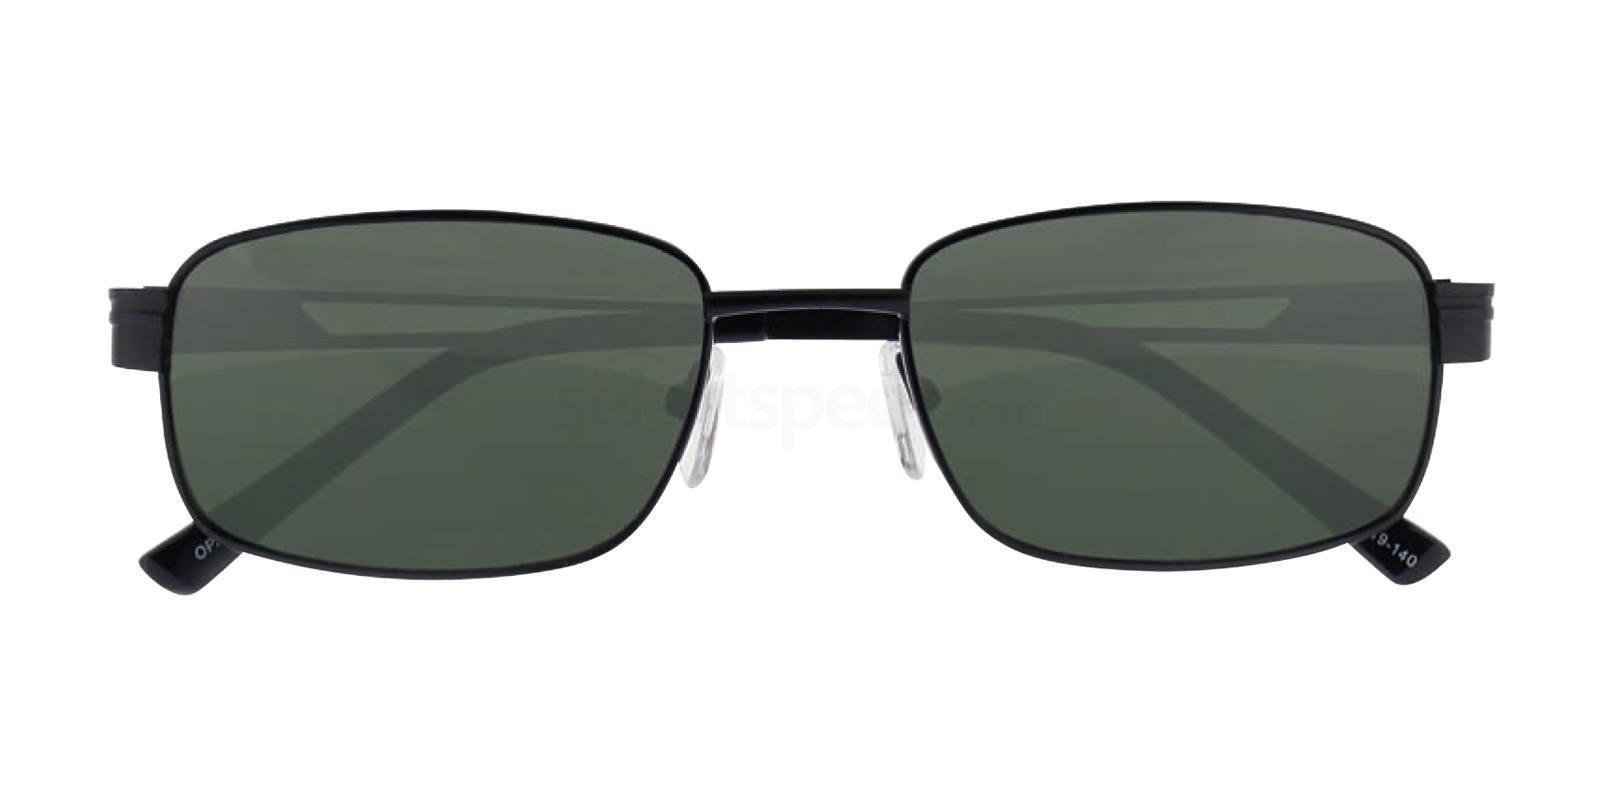 C01 OWMS075 Sunglasses, Owlet